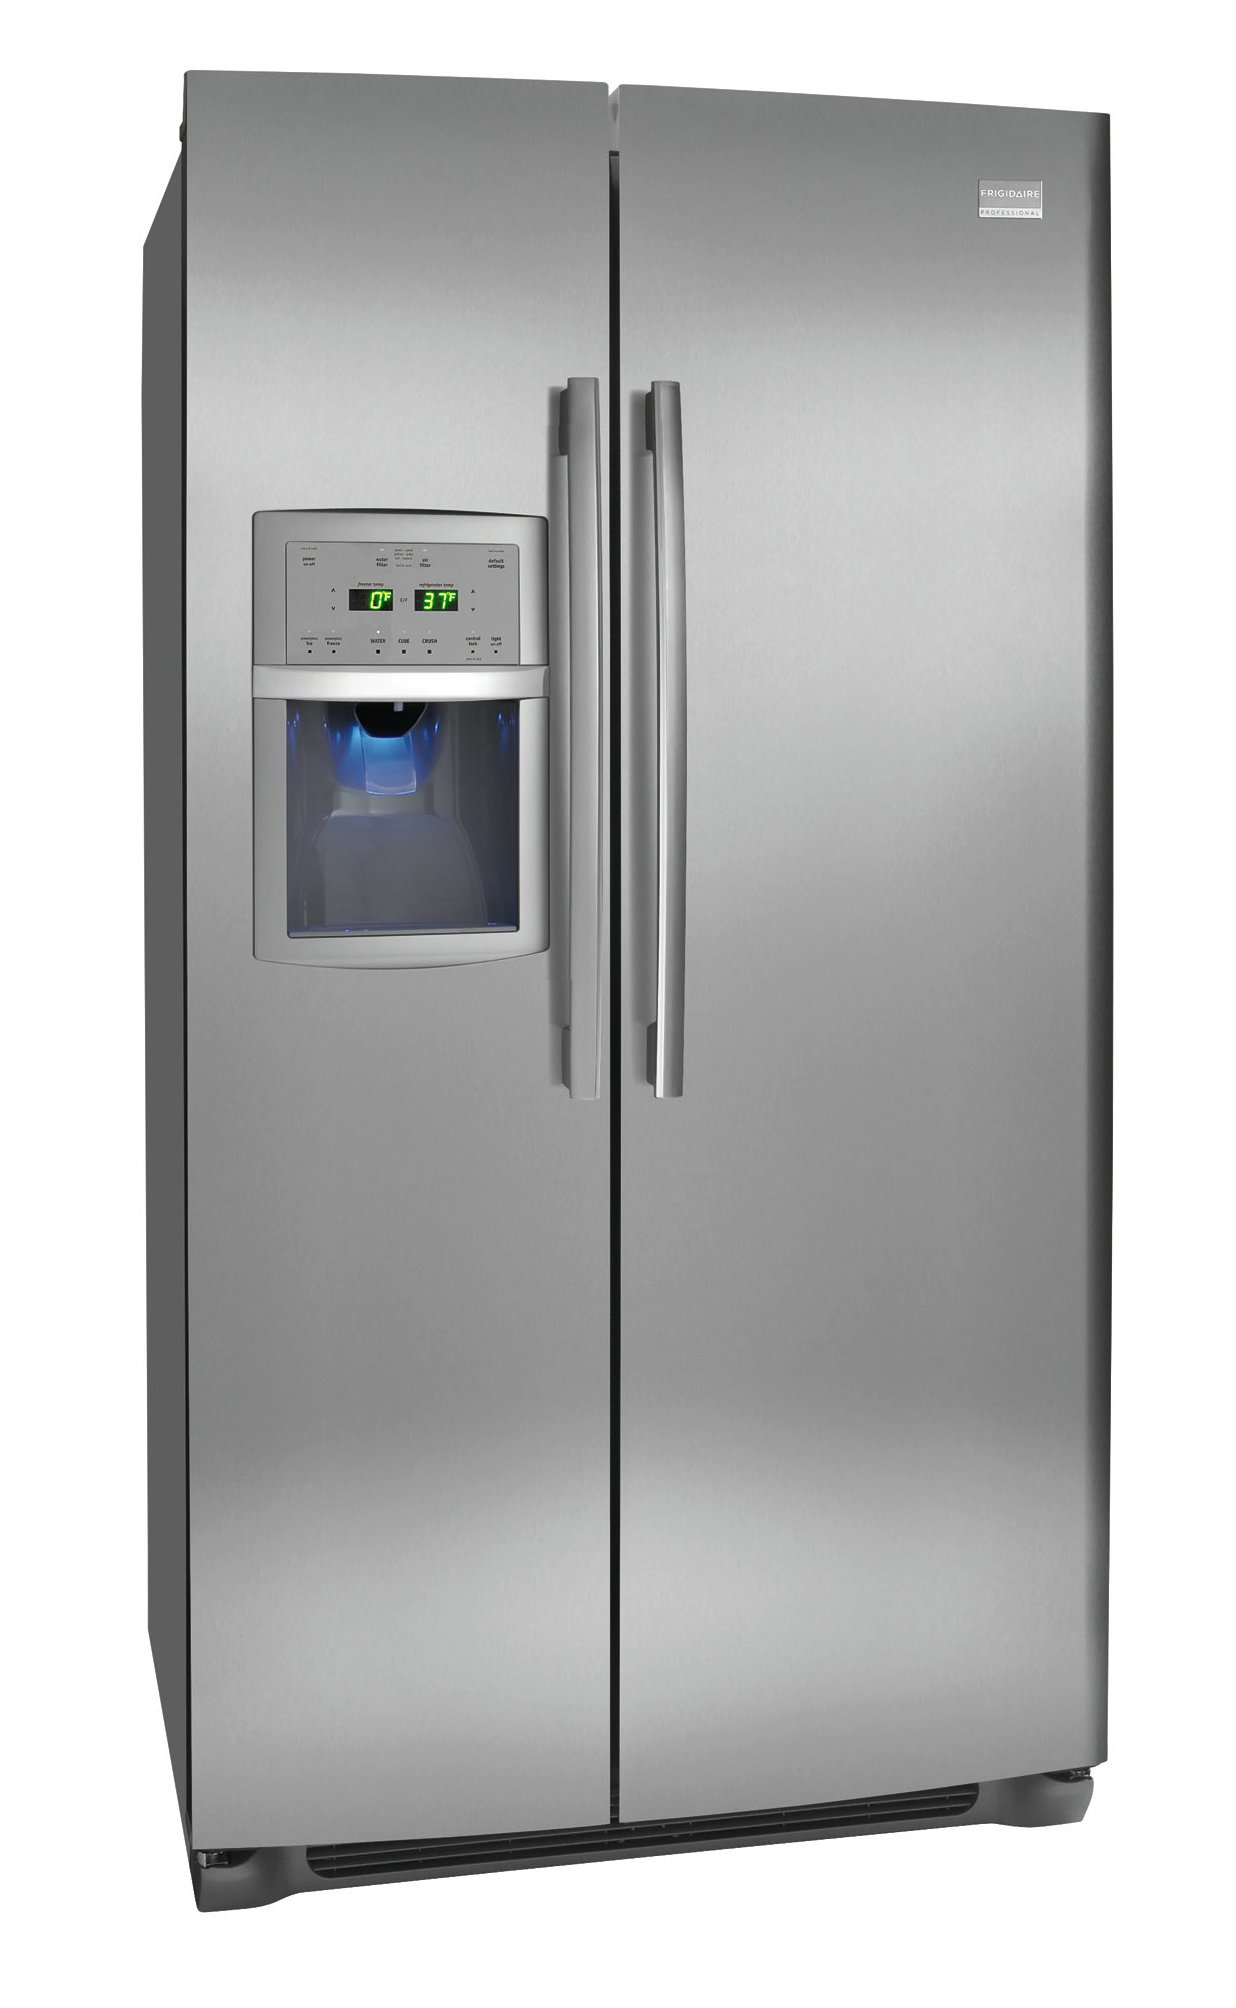 frigidaire gallery dishwasher parts diagram ez go rxv electric wiring refrigerators